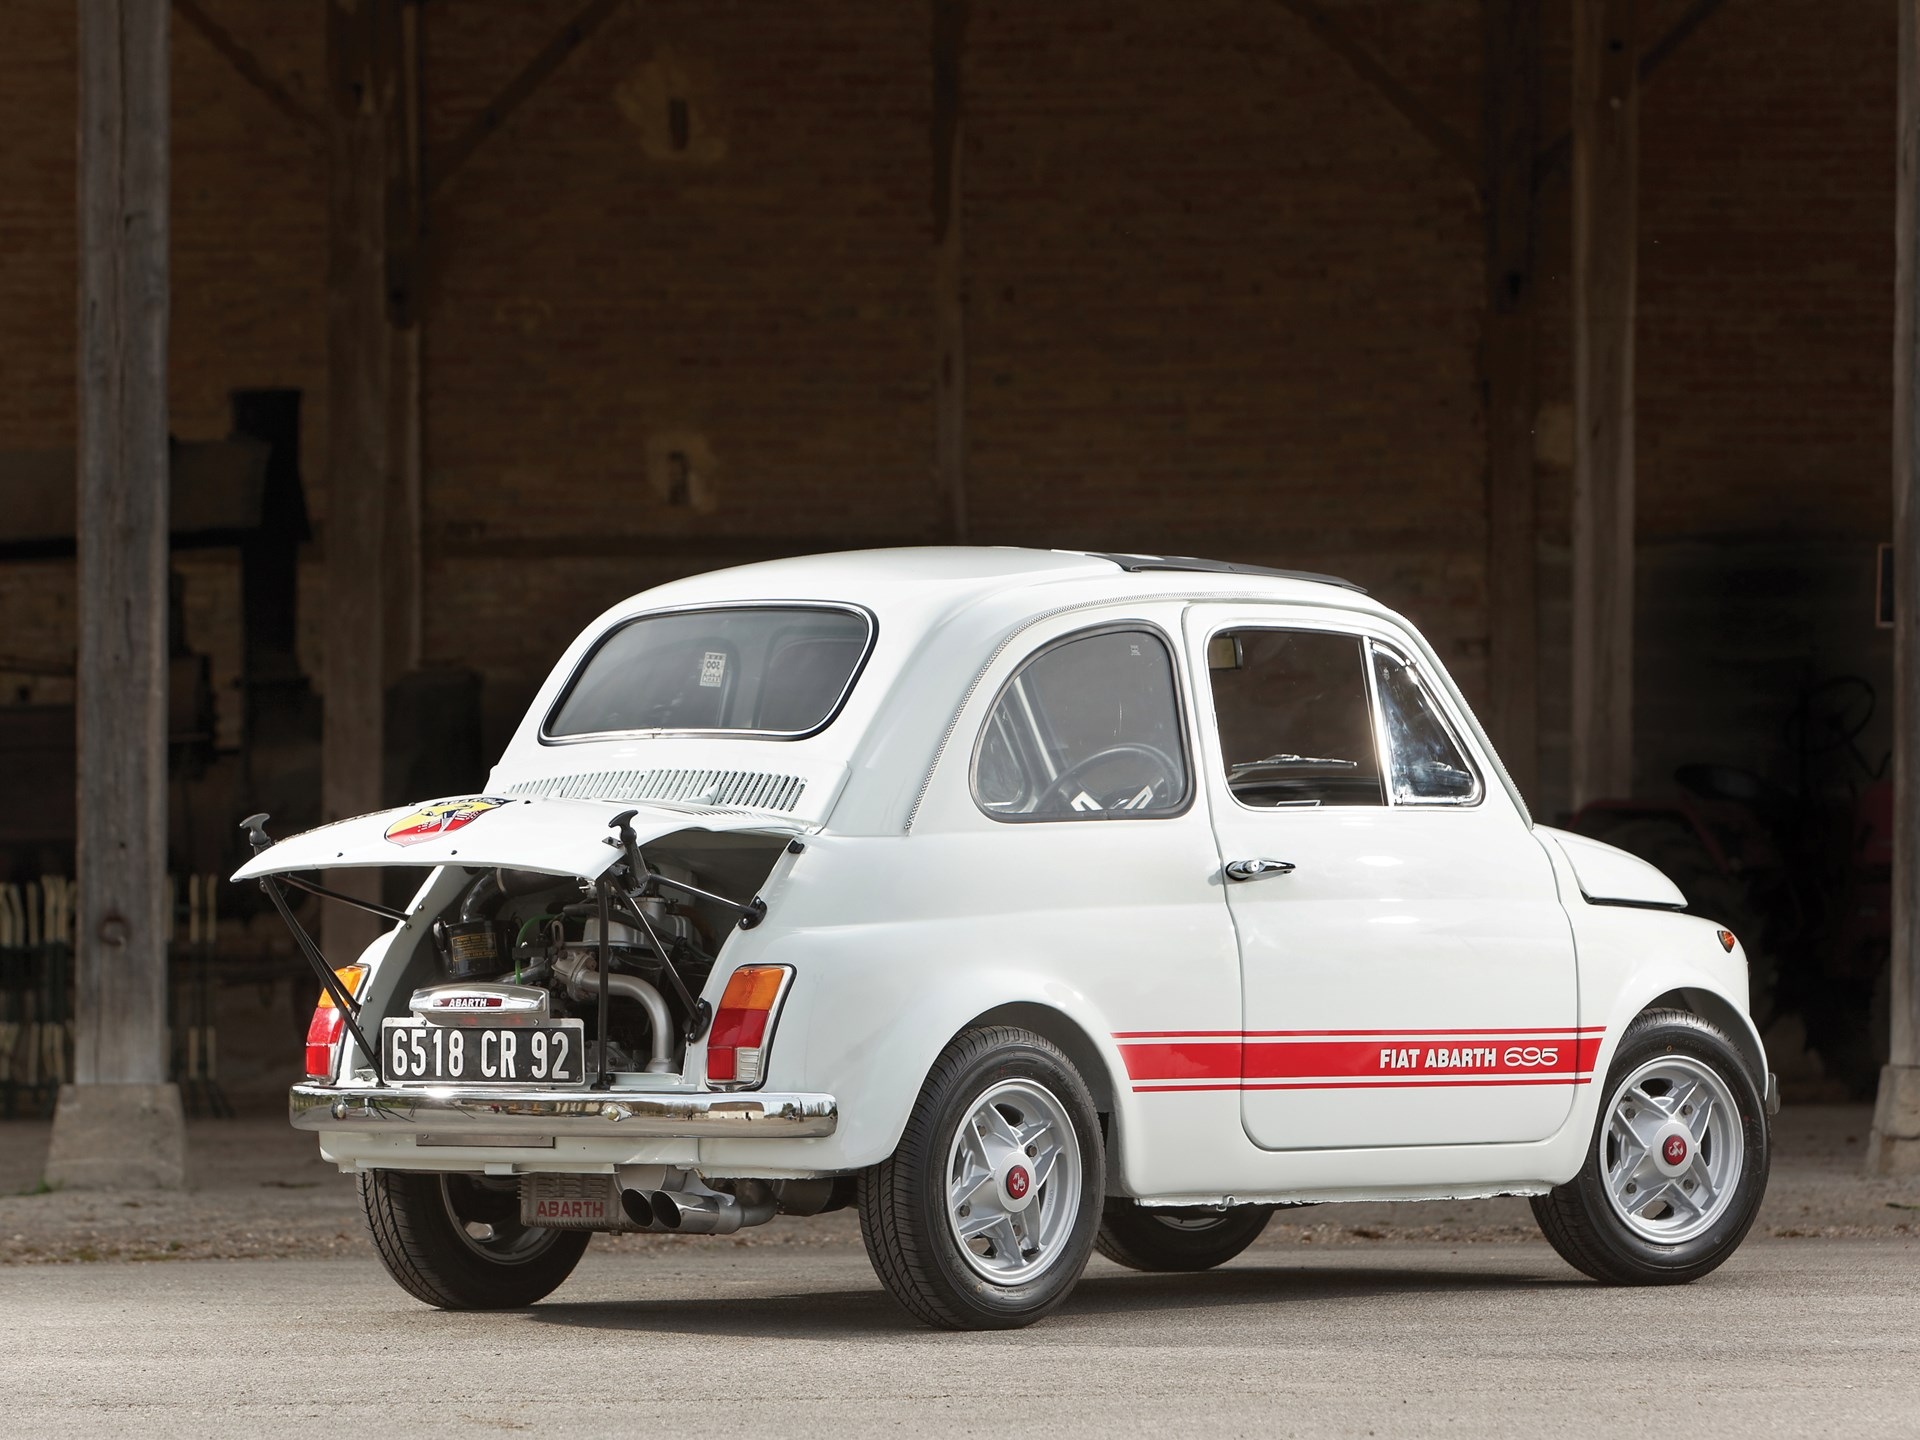 RM Sotheby's - 1970 Fiat Abarth 695 SS | Monaco 2014